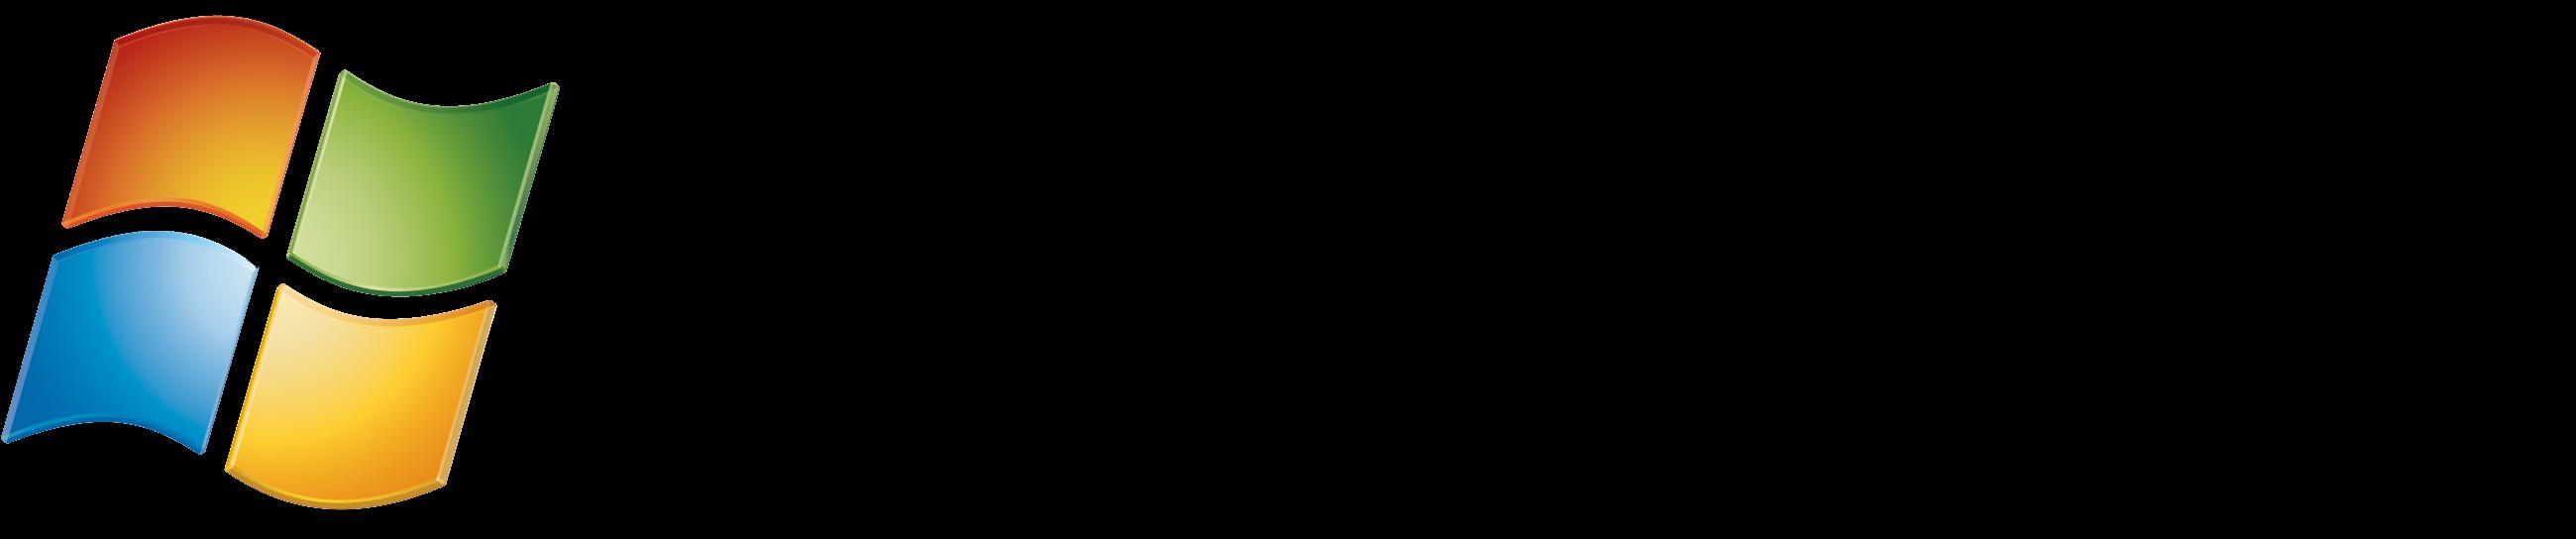 image windowsvista logopng - photo #11